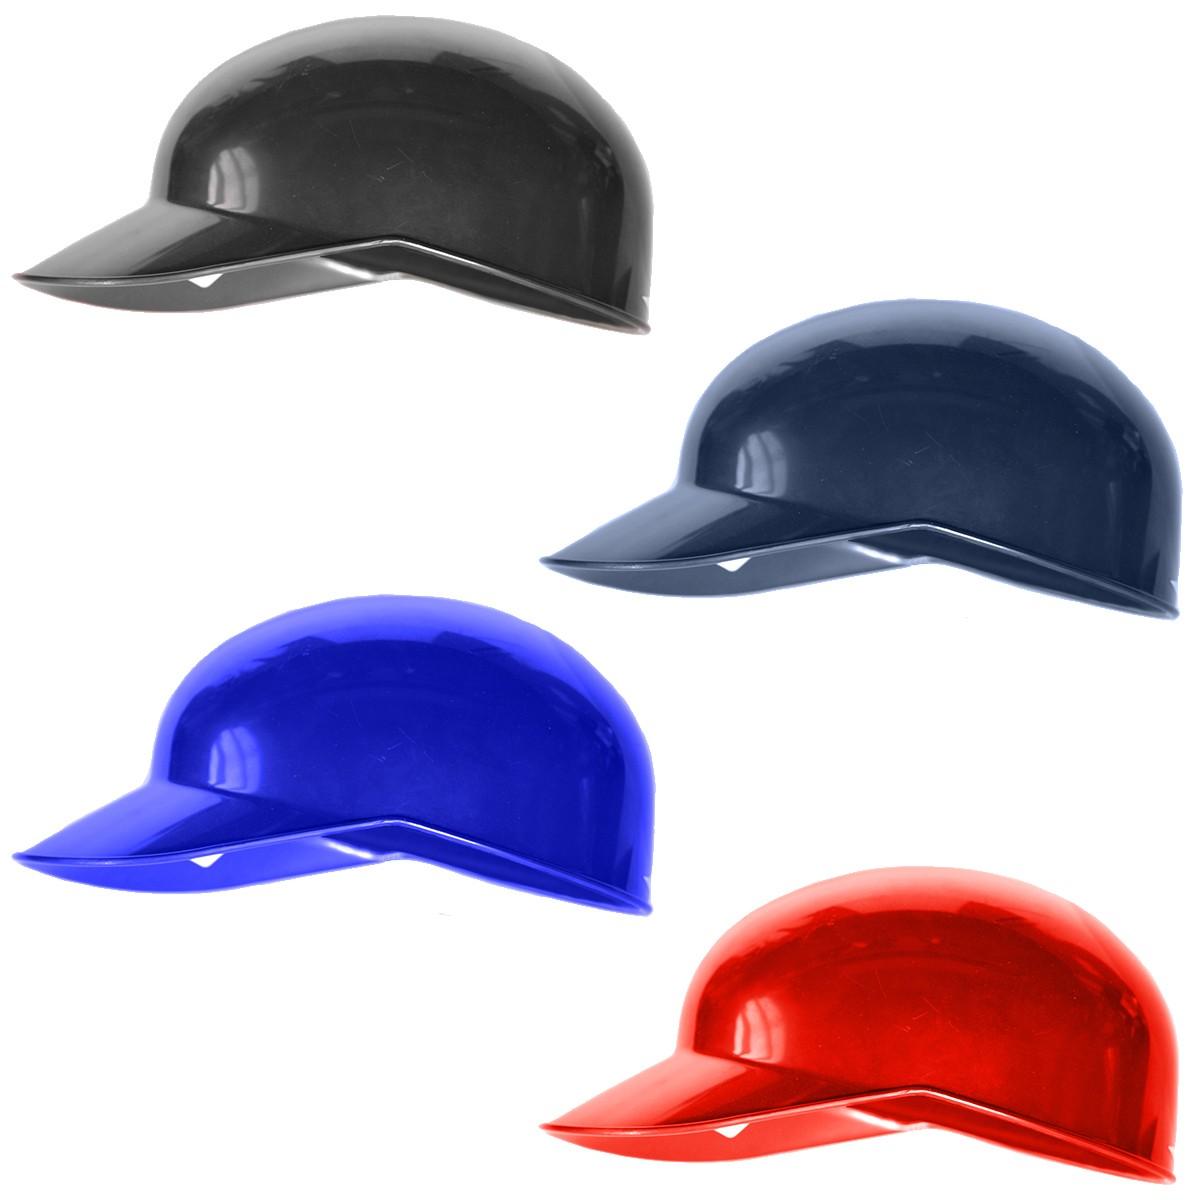 All Star Ch591 Sized Base Coach Helmet Skullcap